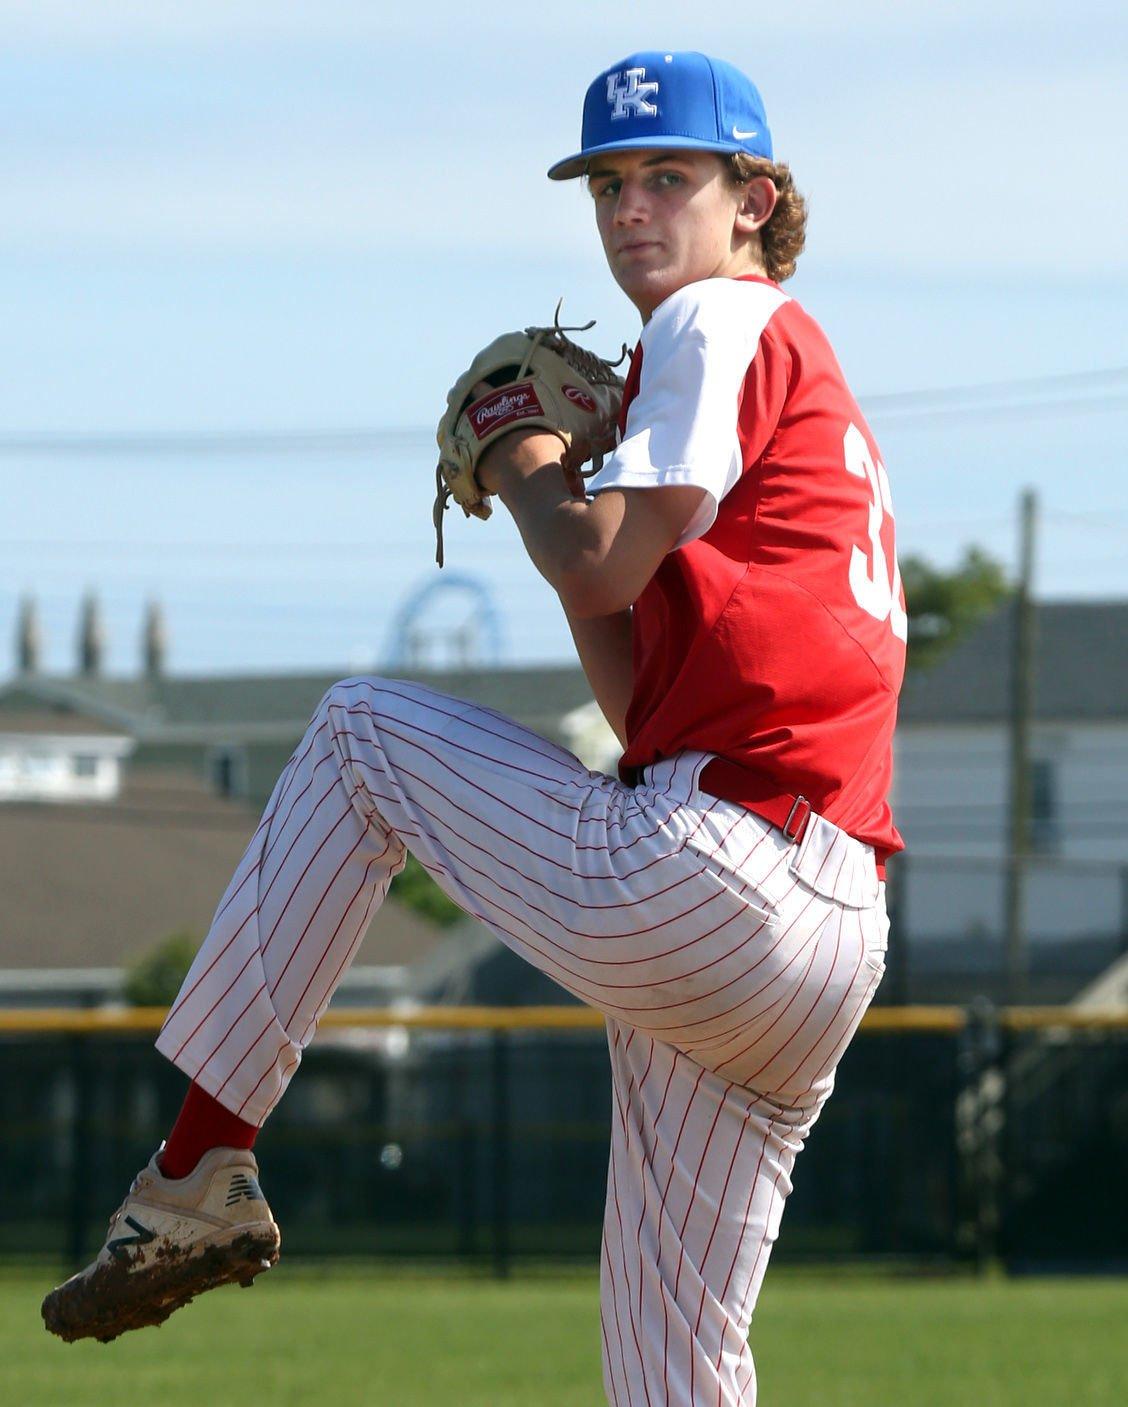 Ocean City pitcher Tom Finnegan